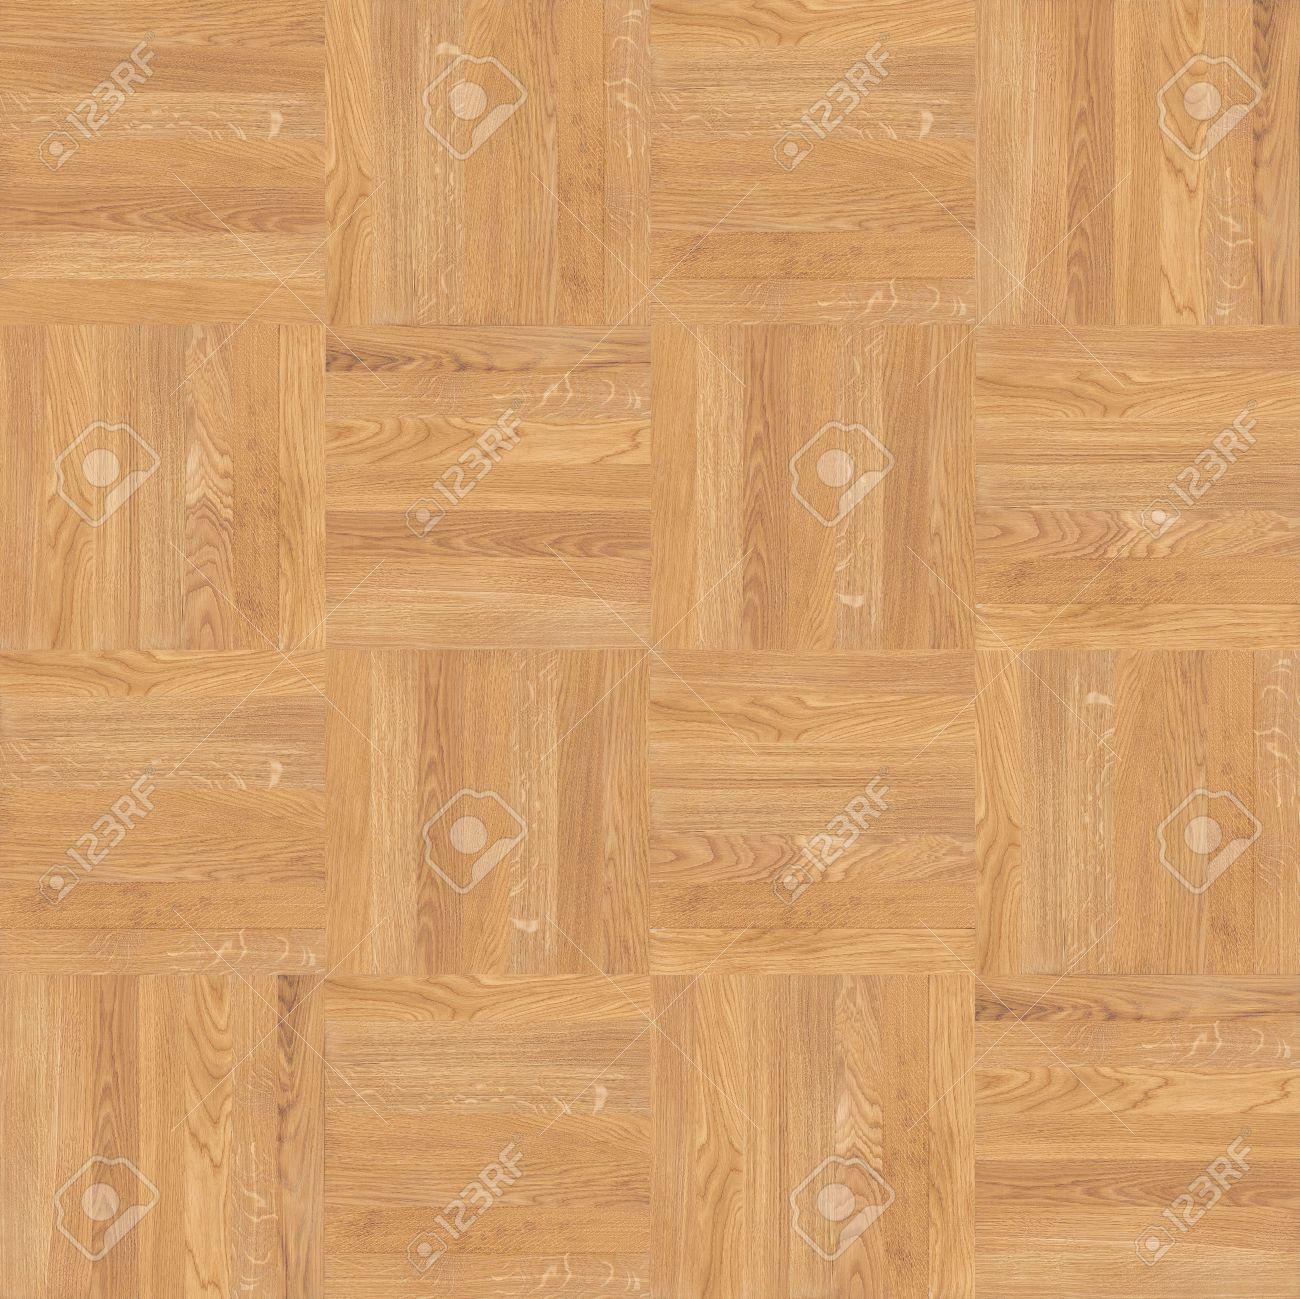 nahtlose fußboden aus holz checker textur lizenzfreie fotos, bilder